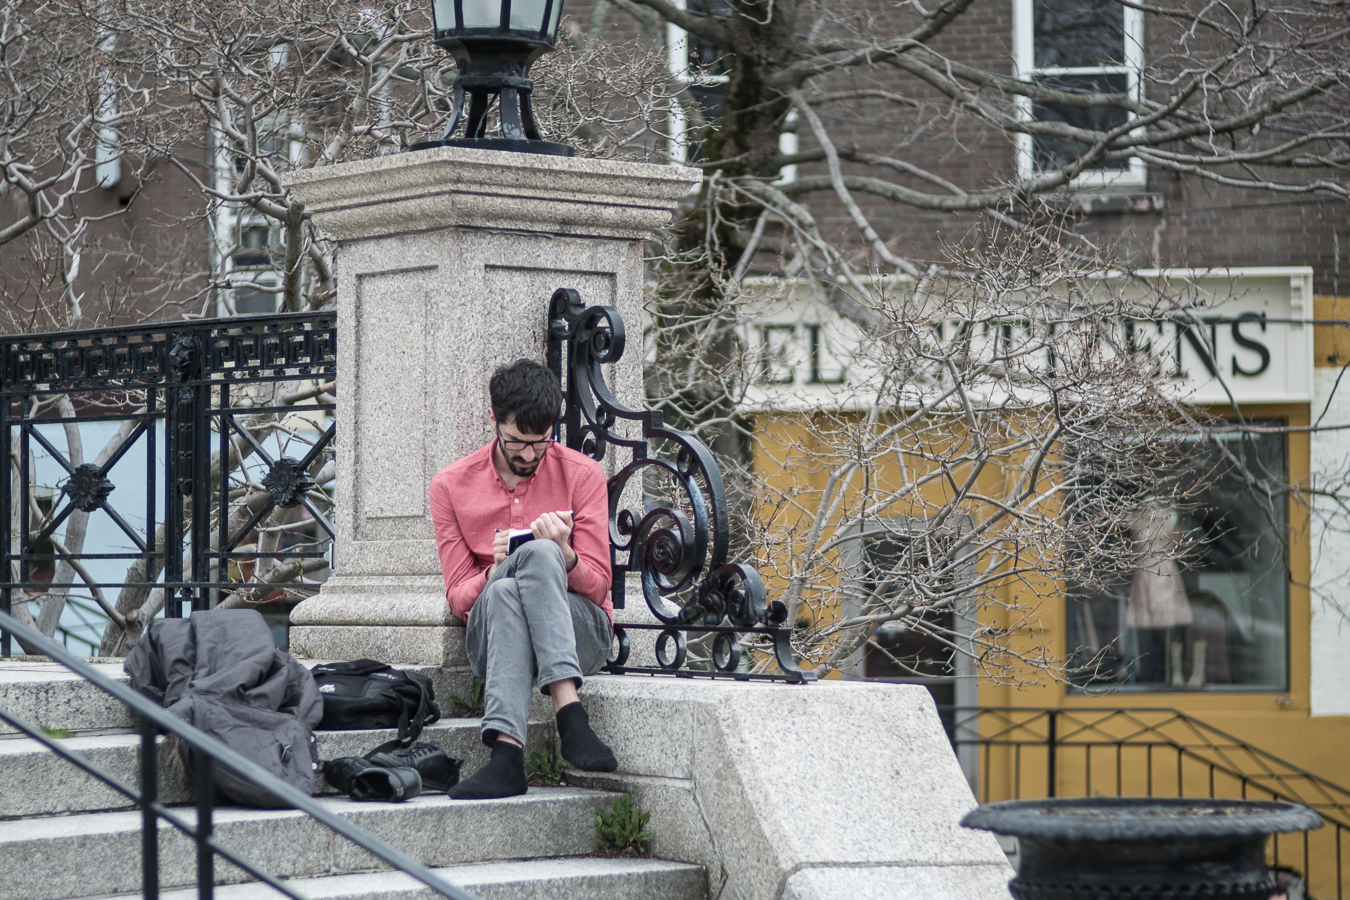 Getting comfortable to write - War Memorial - Duckworth Street